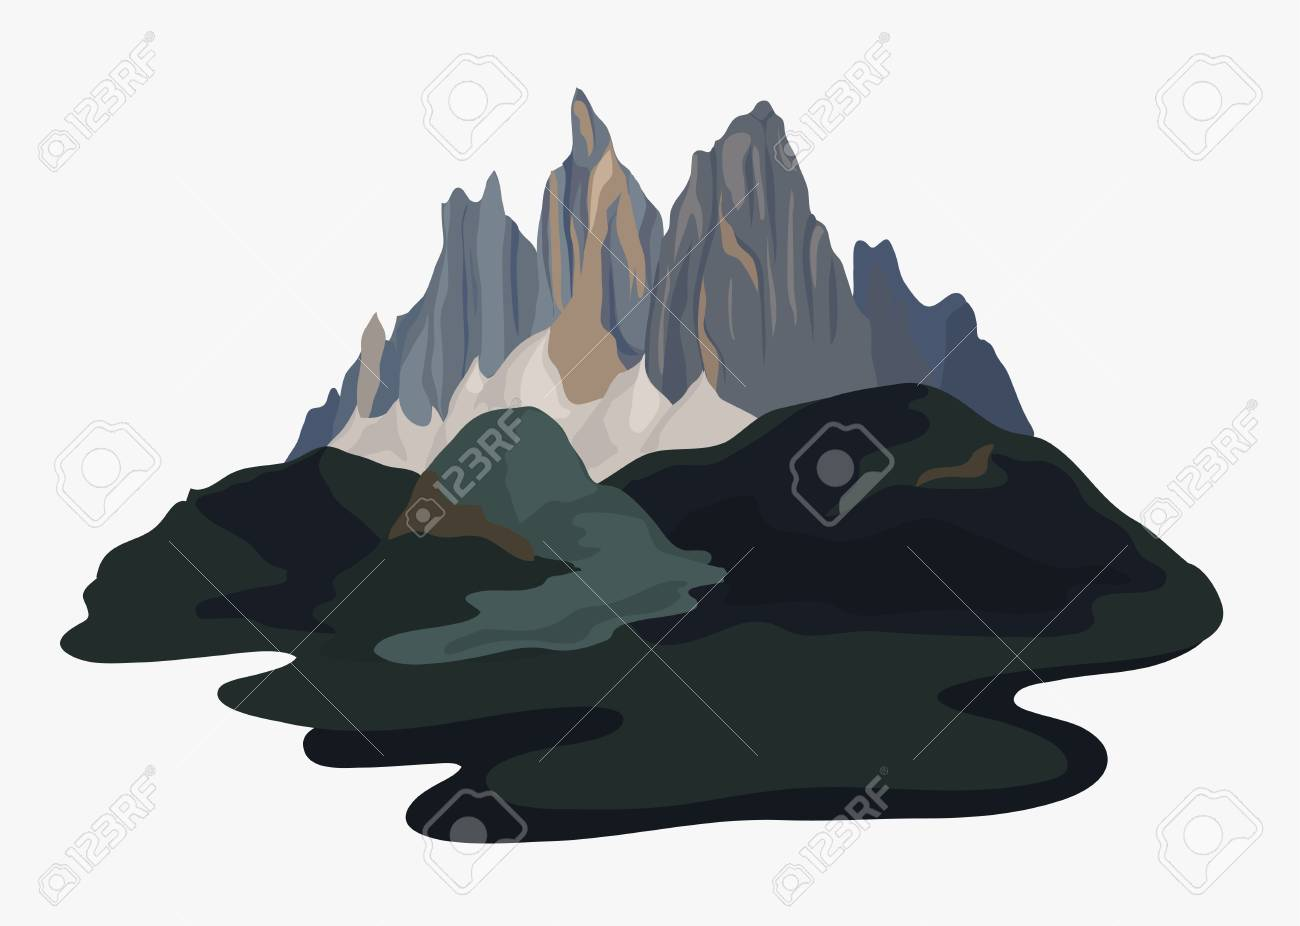 Painted mountain view landscape illustration - 105390849